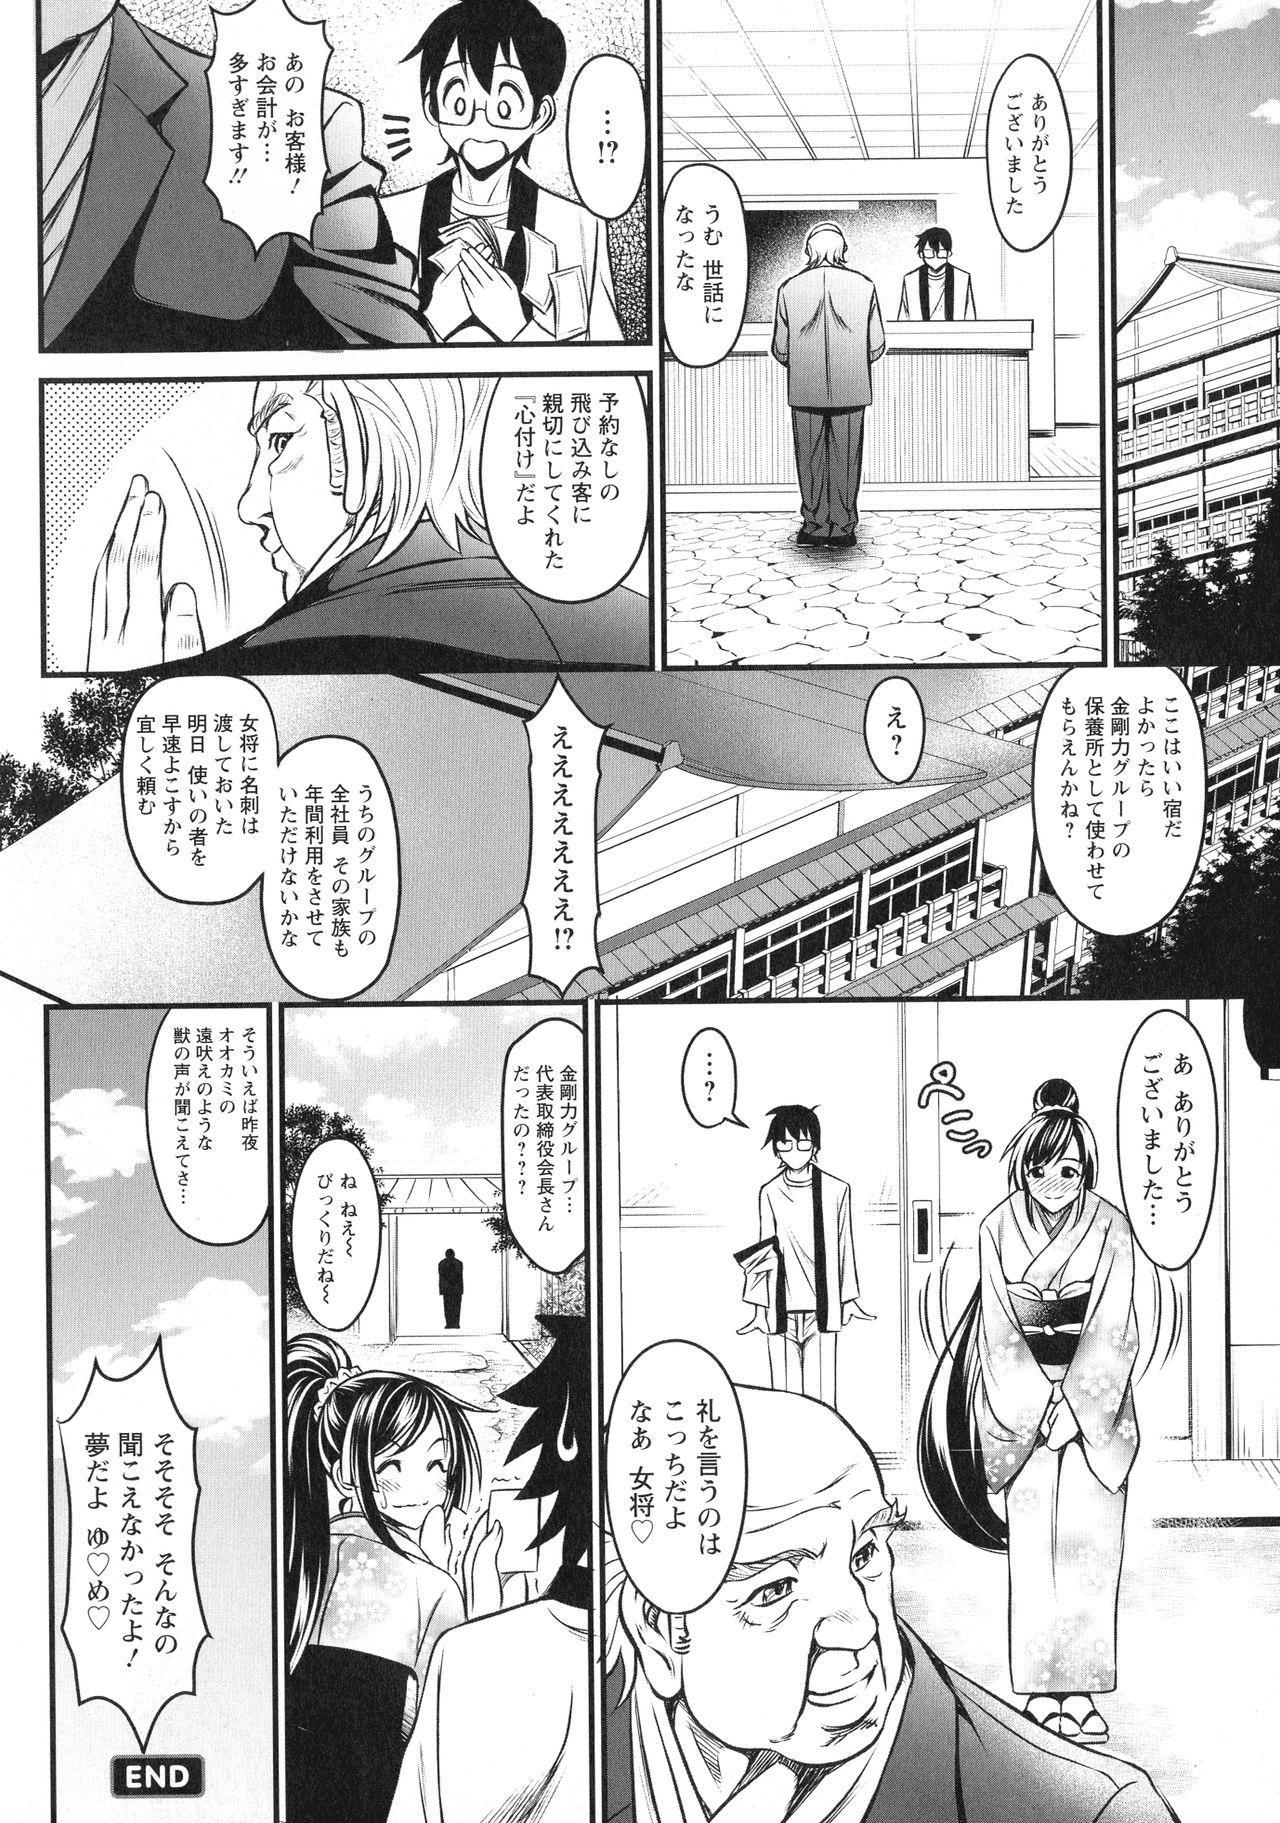 Dokidoki Pretty Angel 141